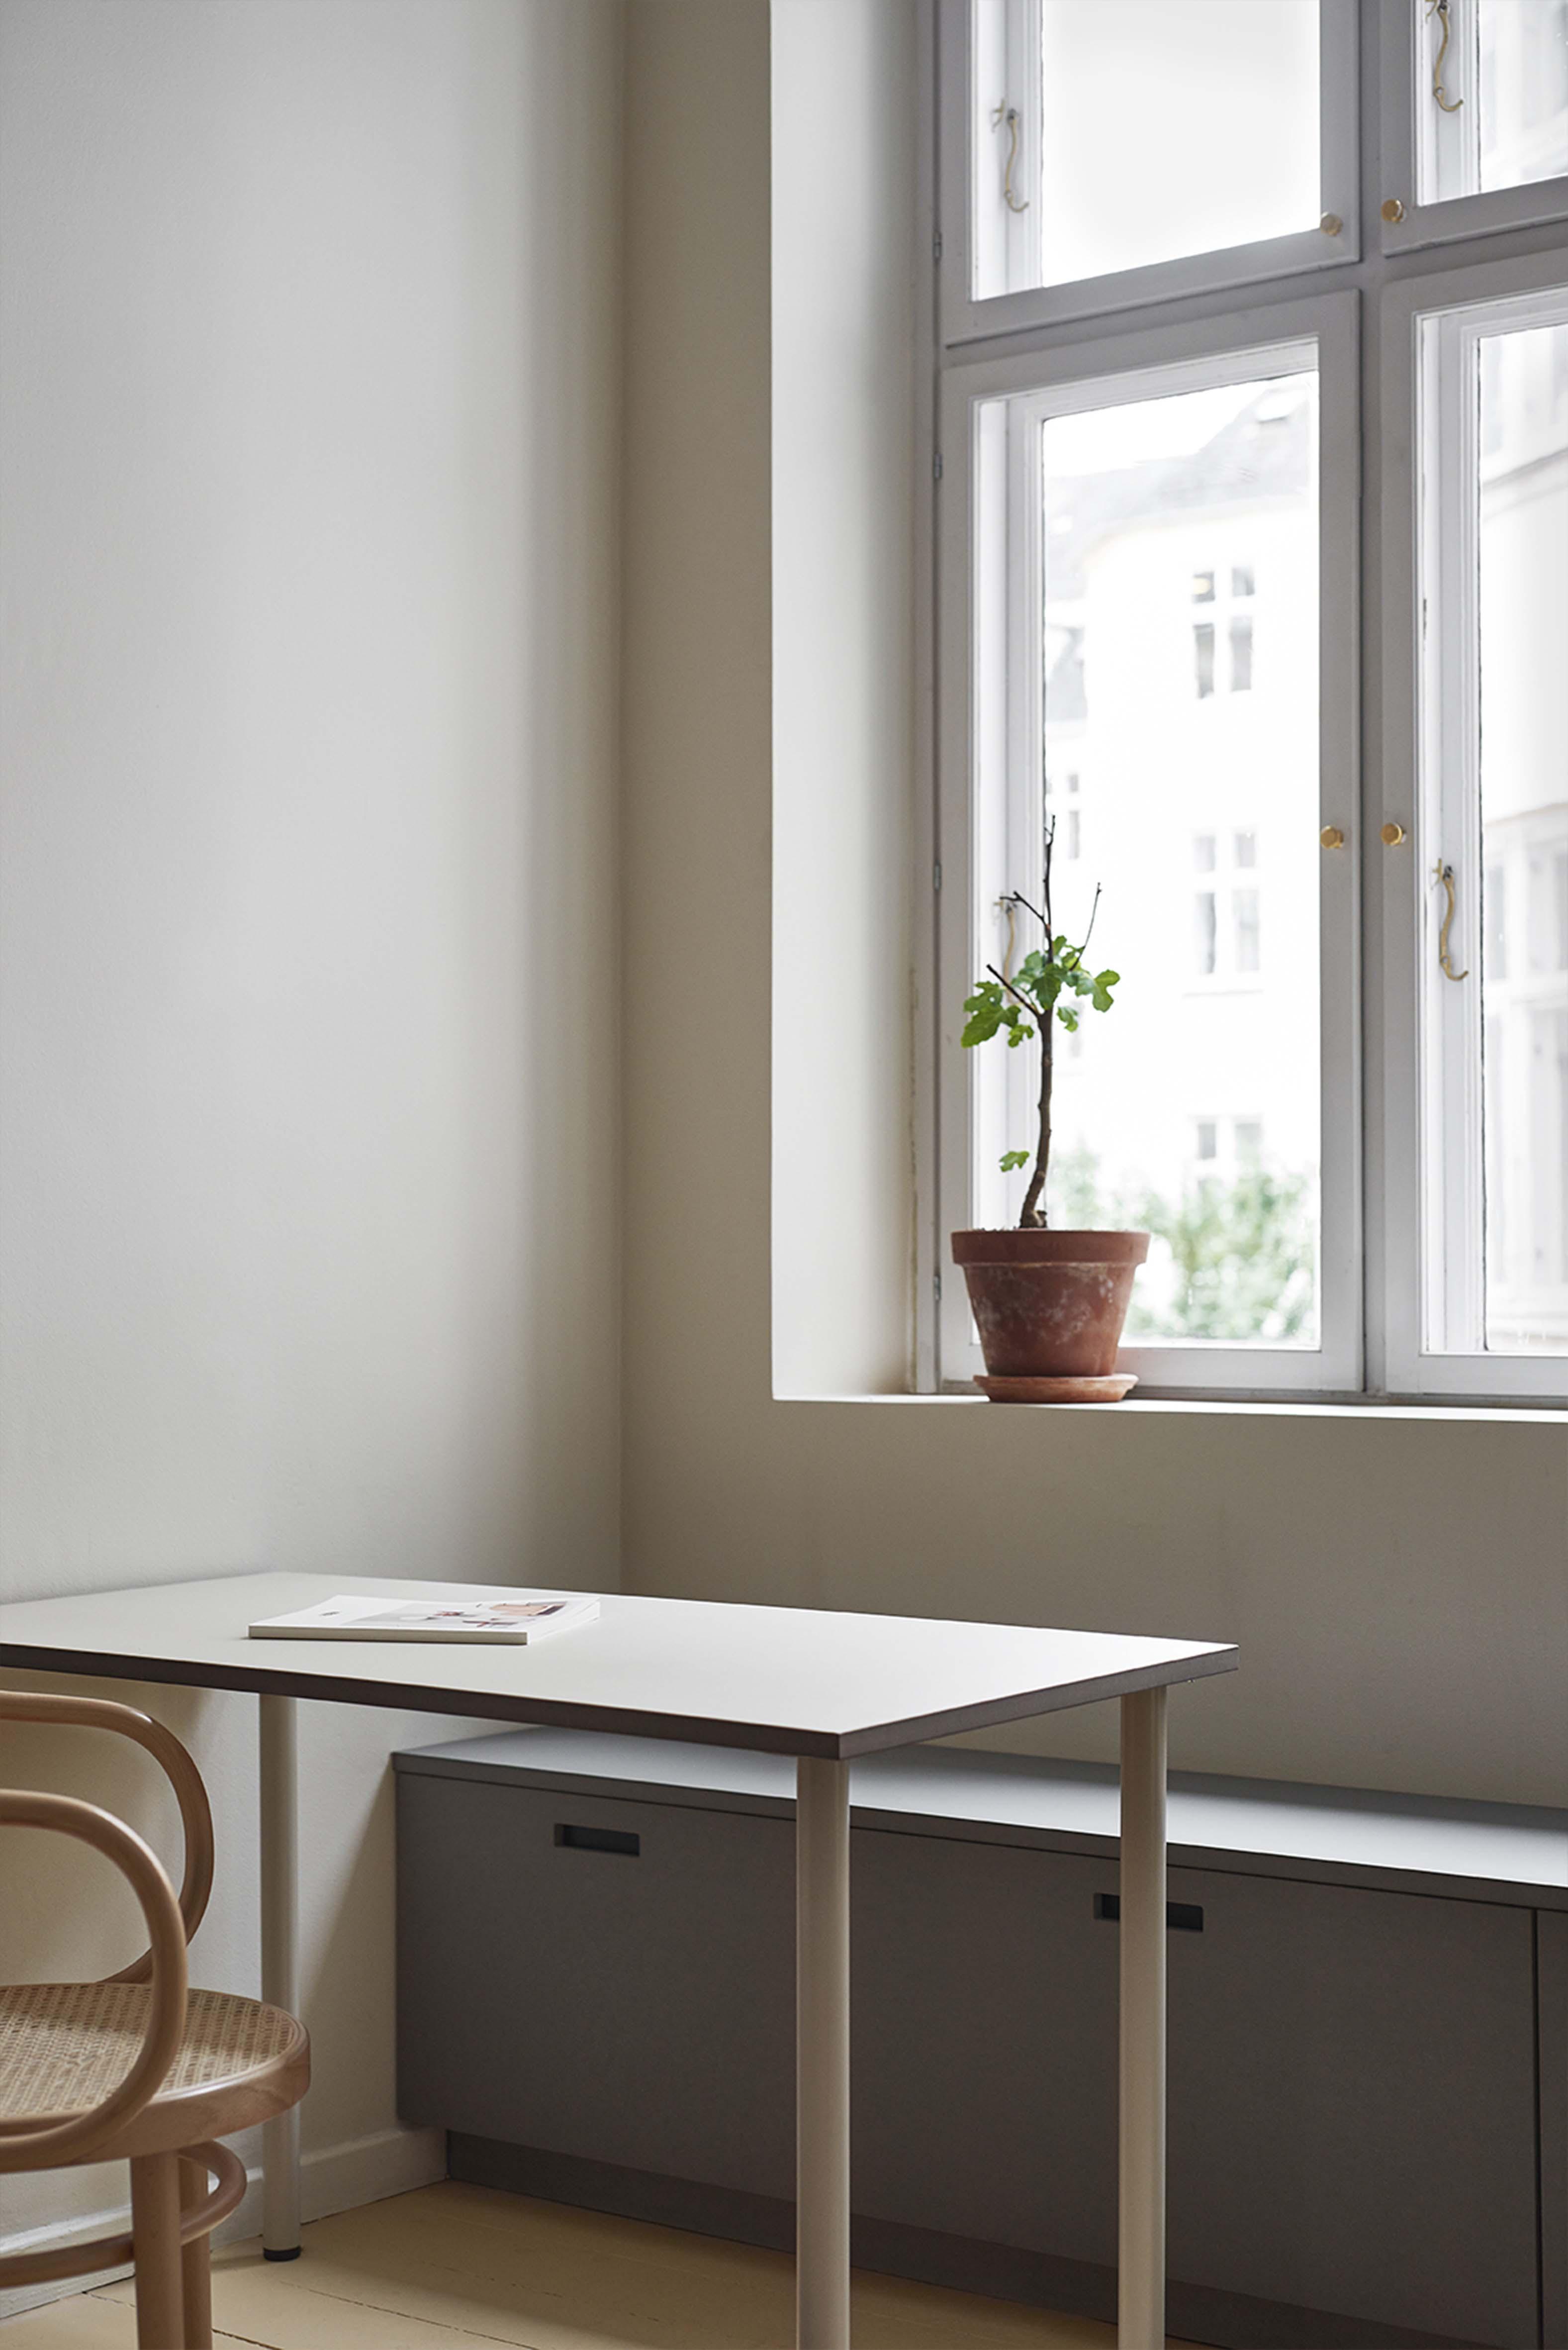 køkken-fronter-ikea-&SHUFL-grå-køkkenlåger-lysegrå-låger